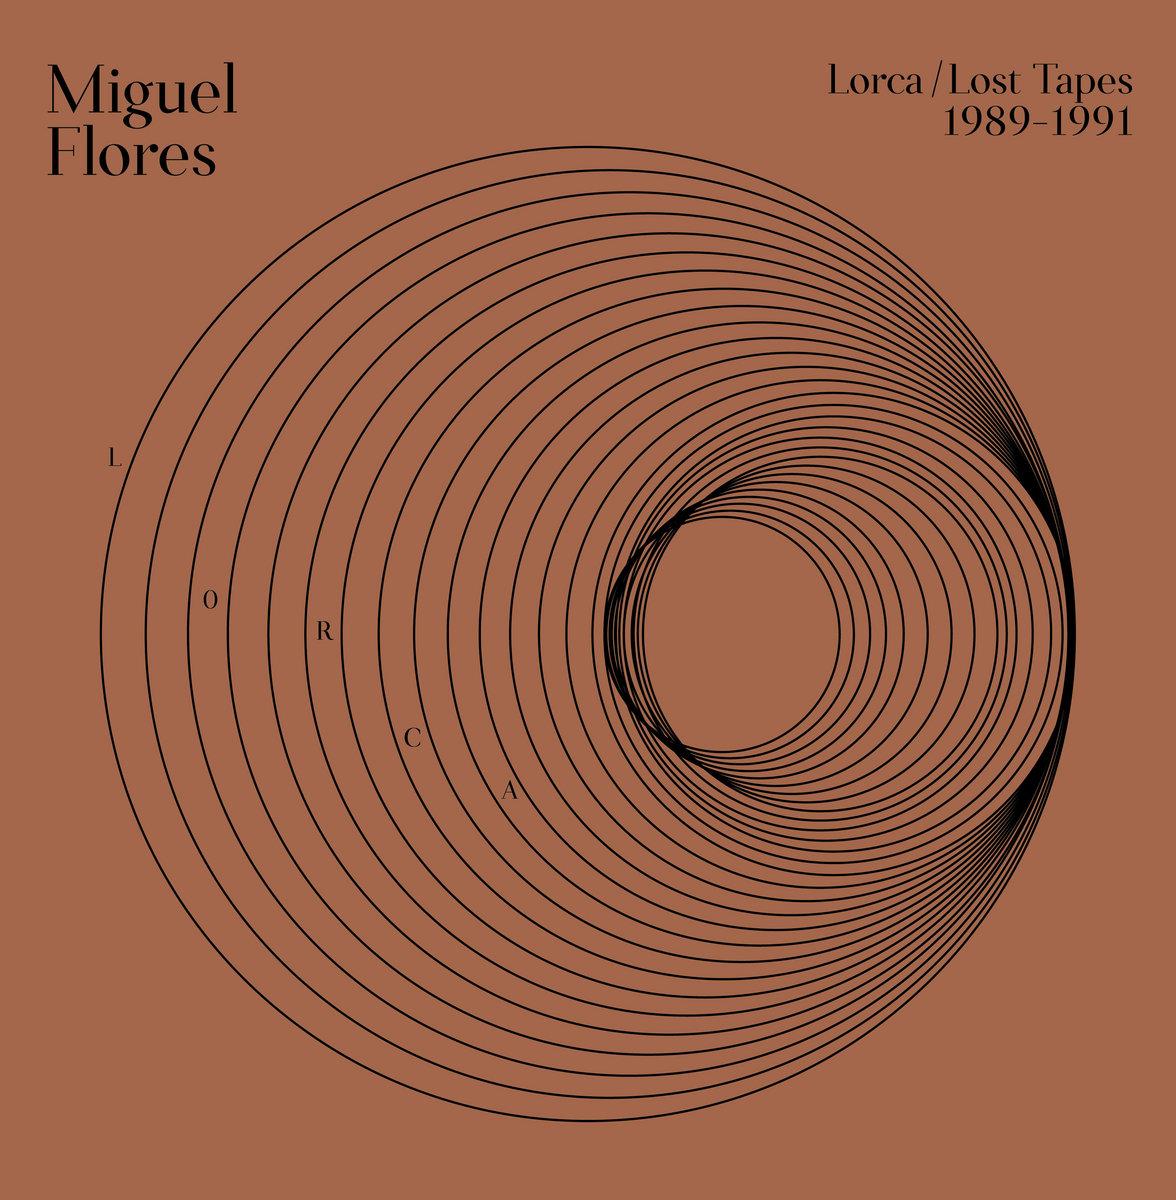 BR121 - Miguel Flores - Lorca: Lost Tapes (1989-1991